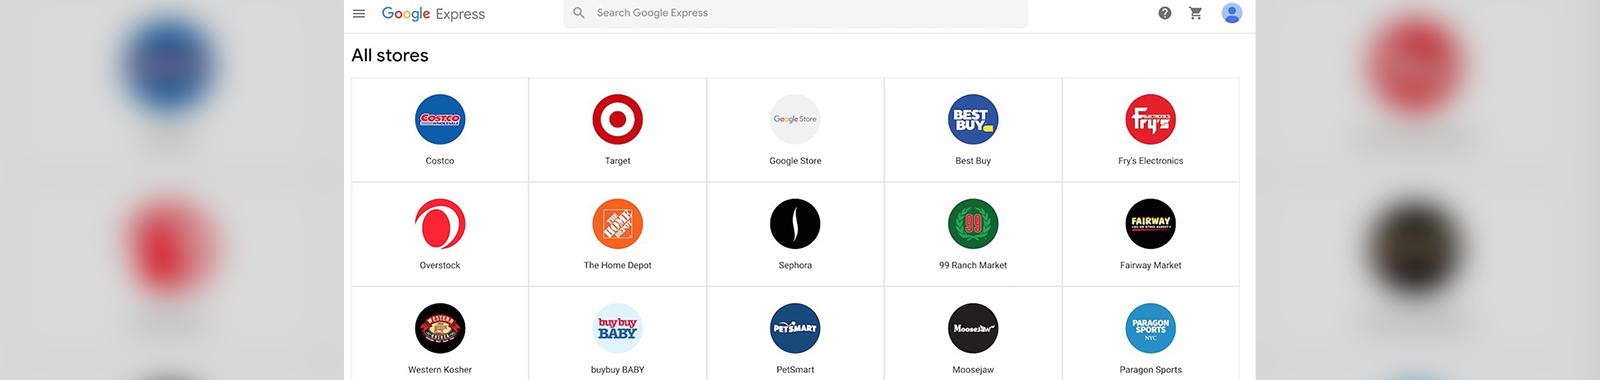 google-express-eye